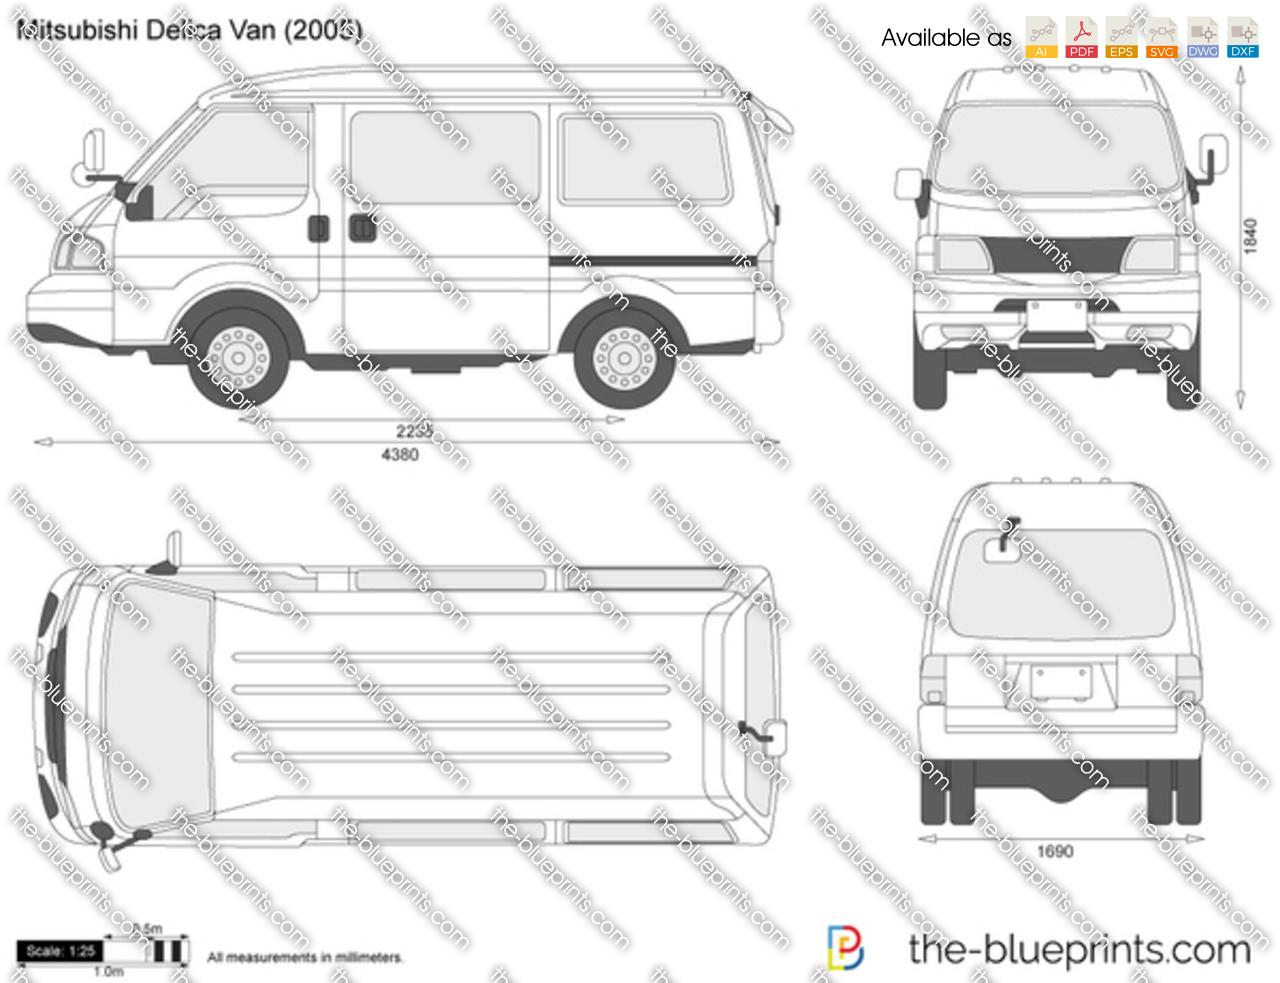 Mitsubishi Delica Van 1988